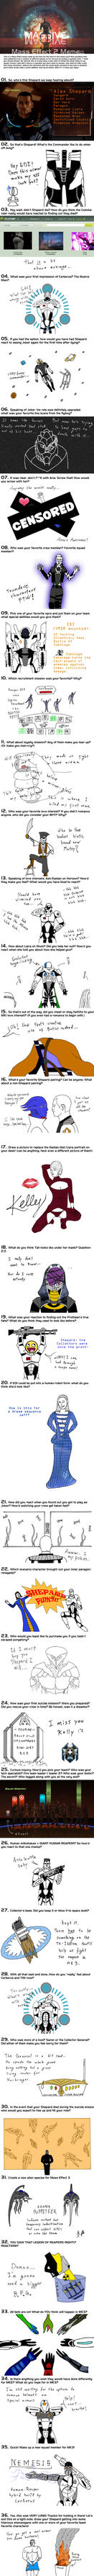 ME2 Massive Meme by flare8521